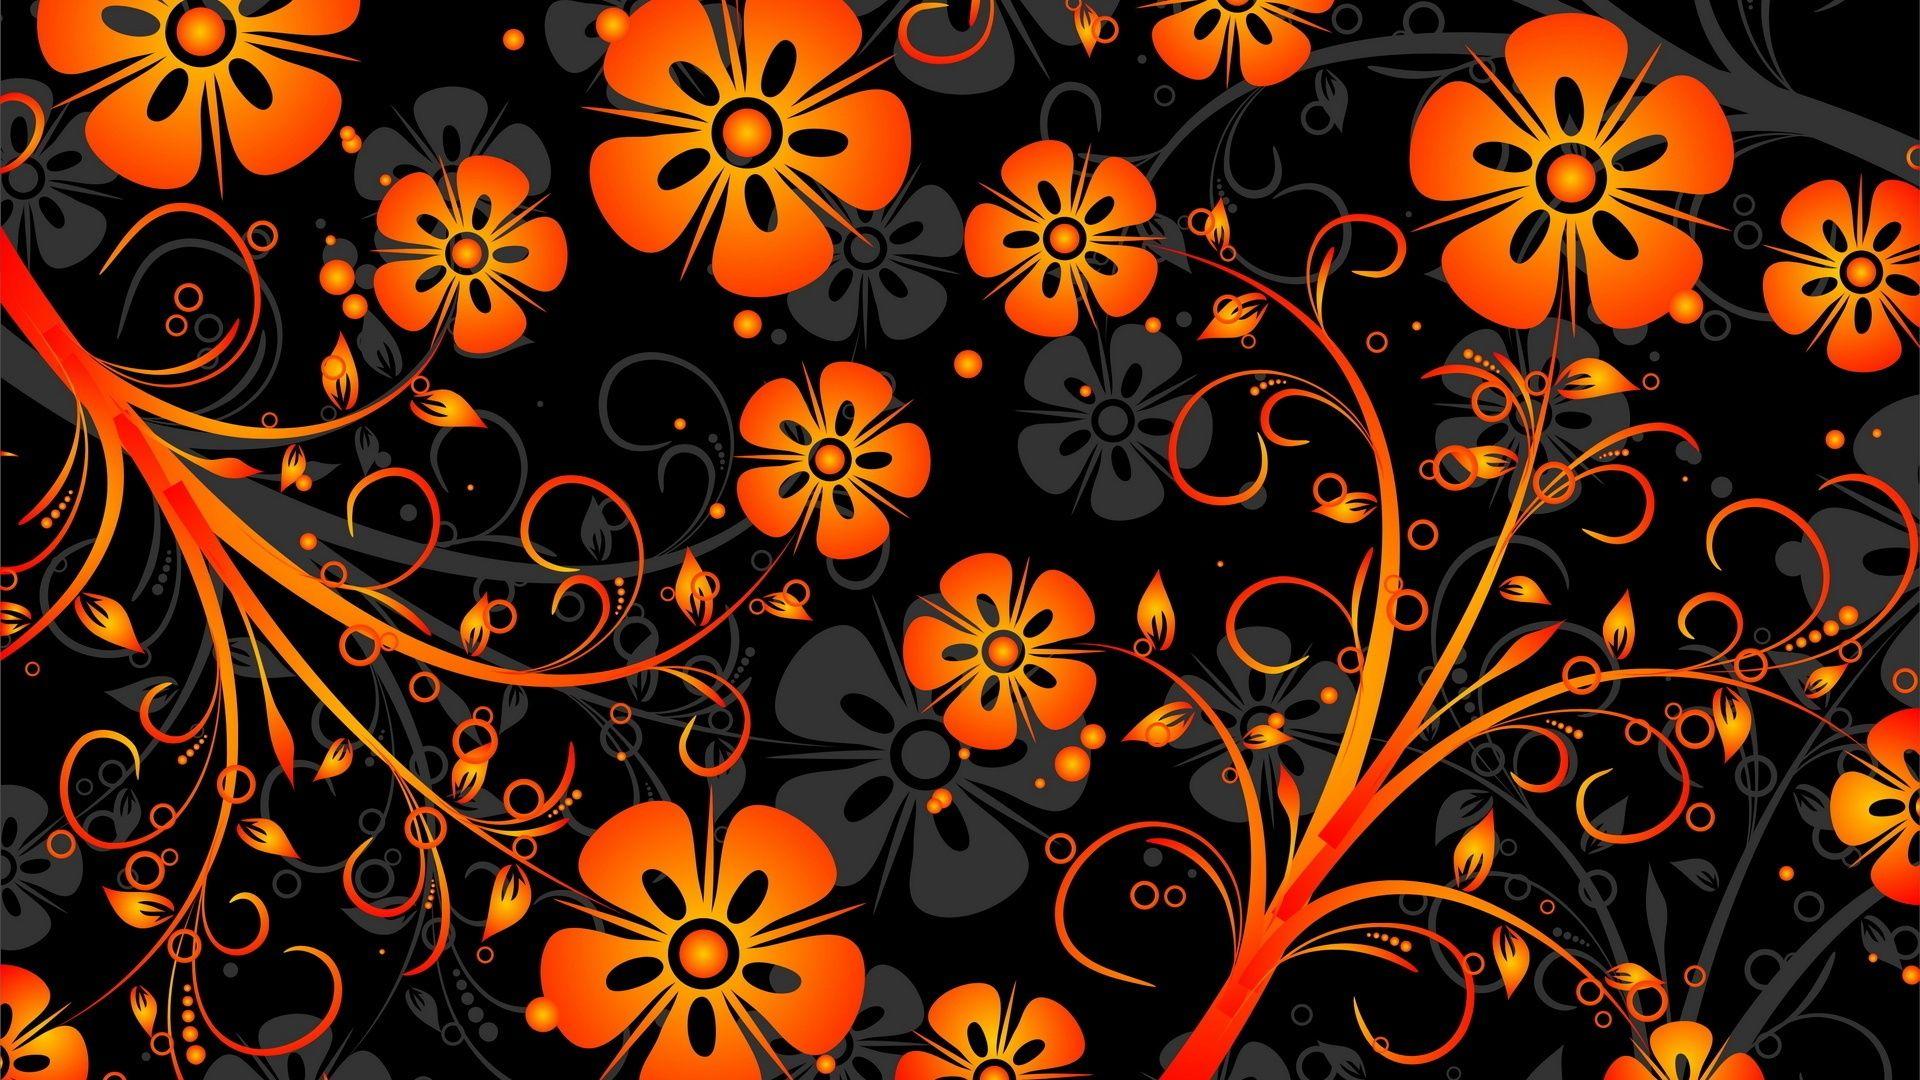 Orange Wallpaper Desktop, Flowers On Black Background